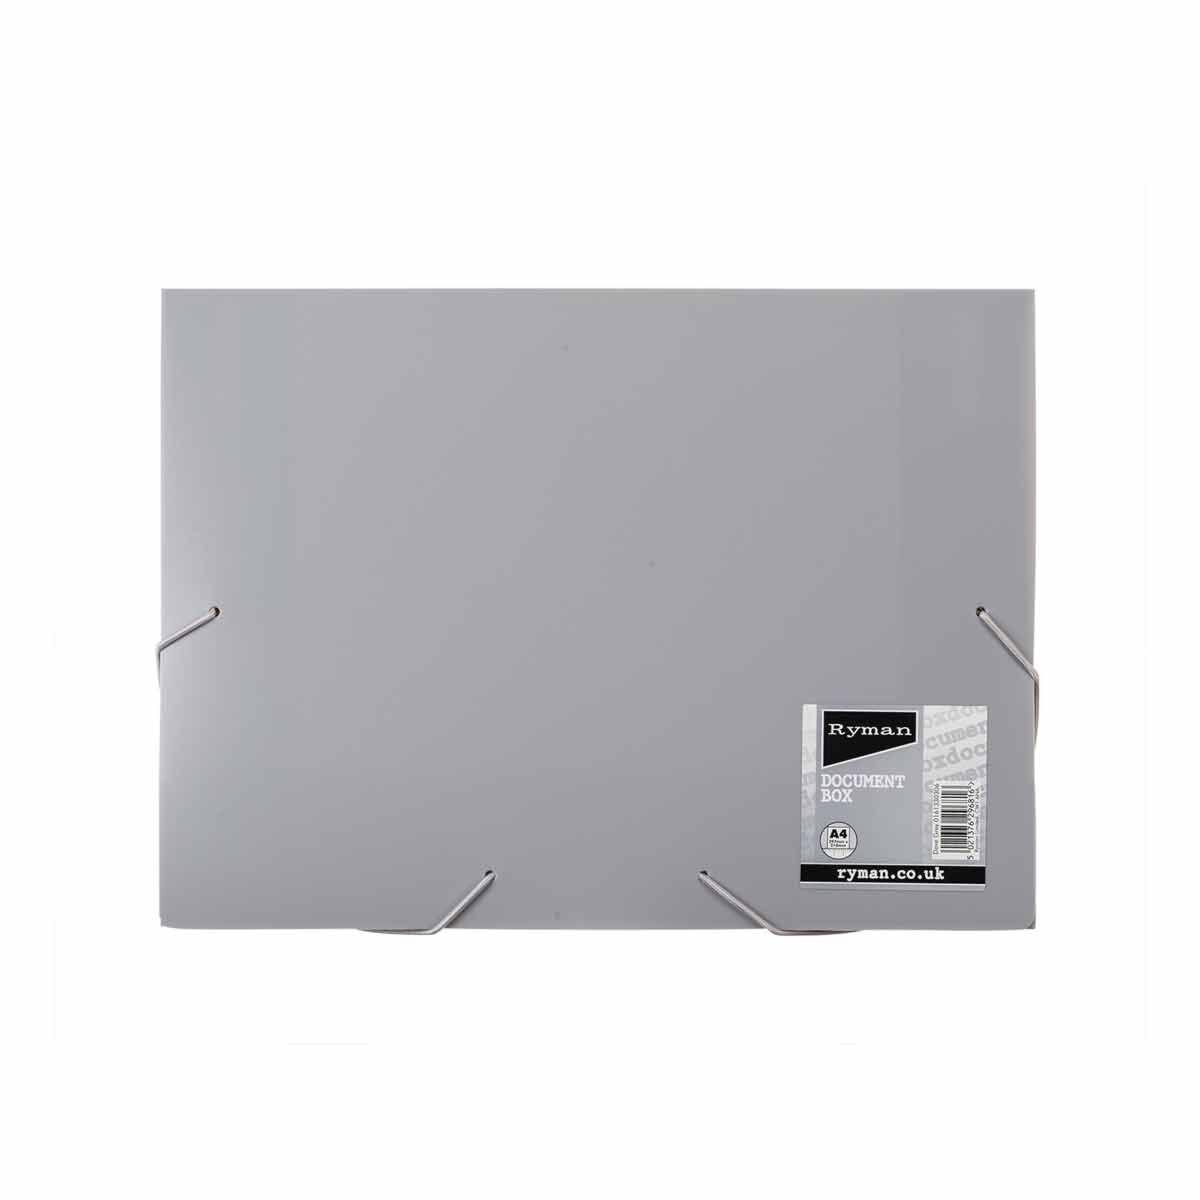 Ryman Pastel Document Box A4